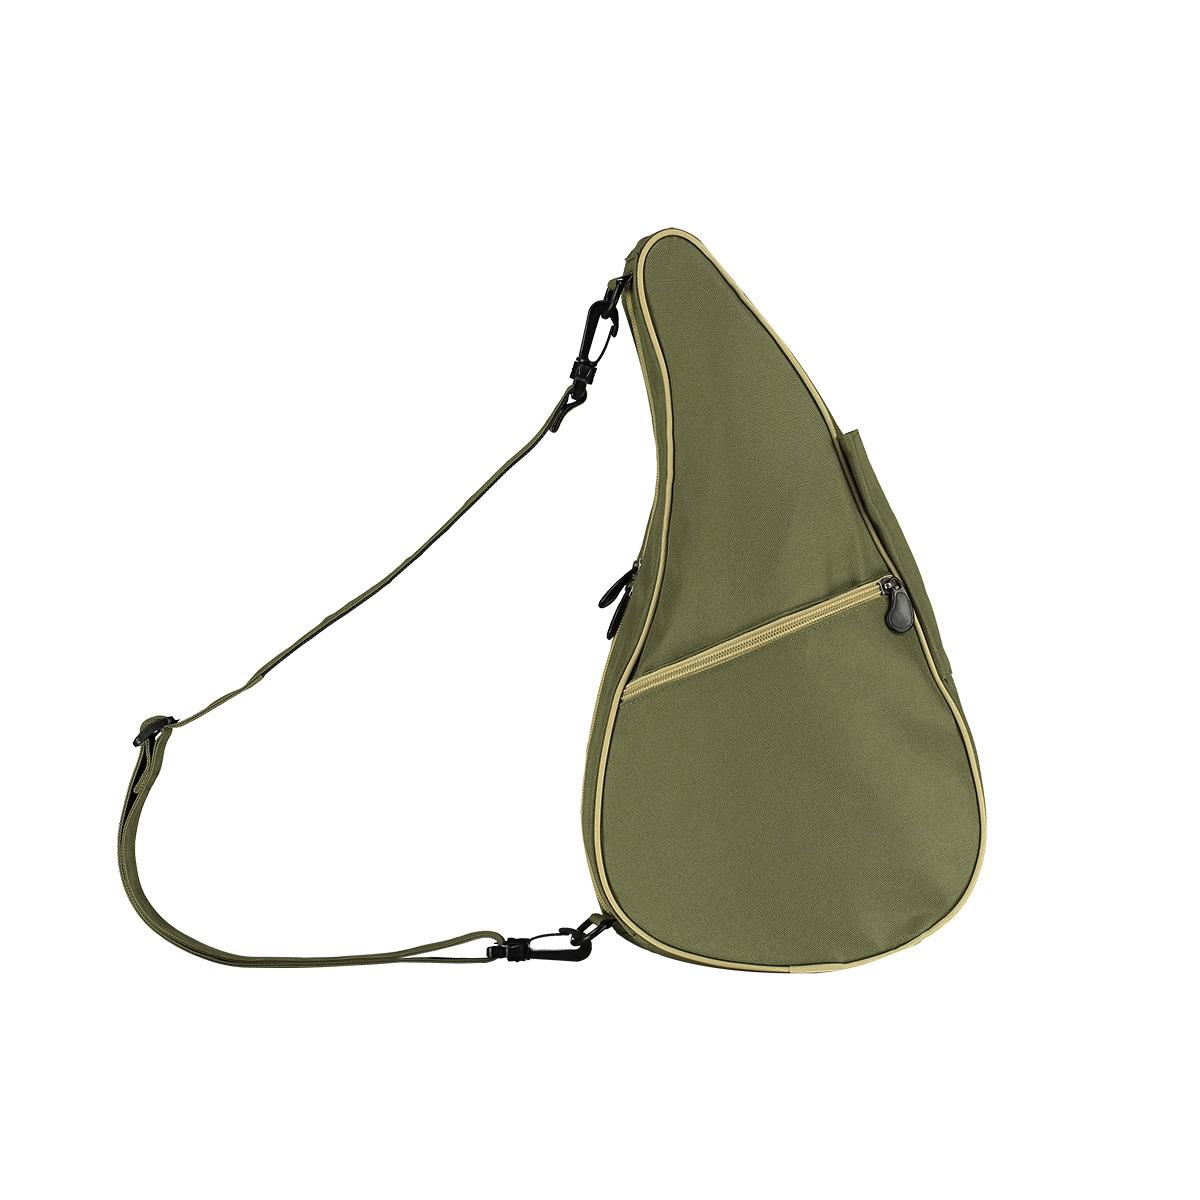 Healthy Back Bag/ヘルシーバックバッグ/ショルダーバッグ/ボディバッグ/旅行バッグ/軽量/レディース/メンズ 《限定ポーチ付》 公式ストア ヘルシーバックバッグ リバーシブル Sサイズ モシーオーク/シエラ